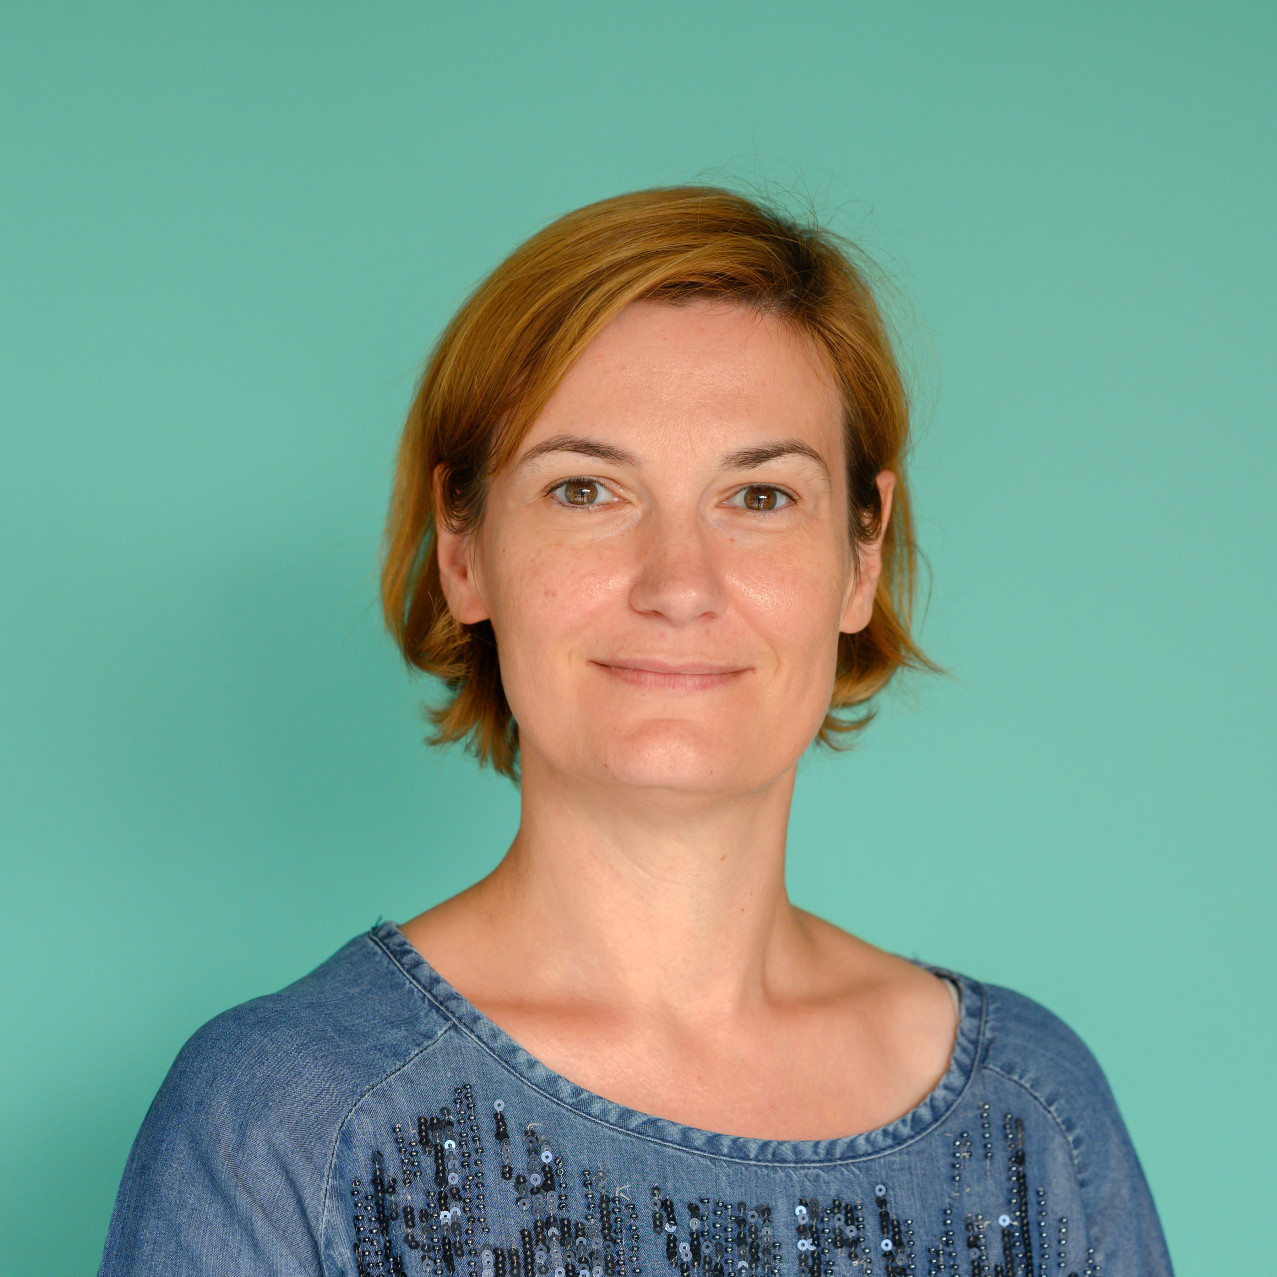 Nathalie Ponnet